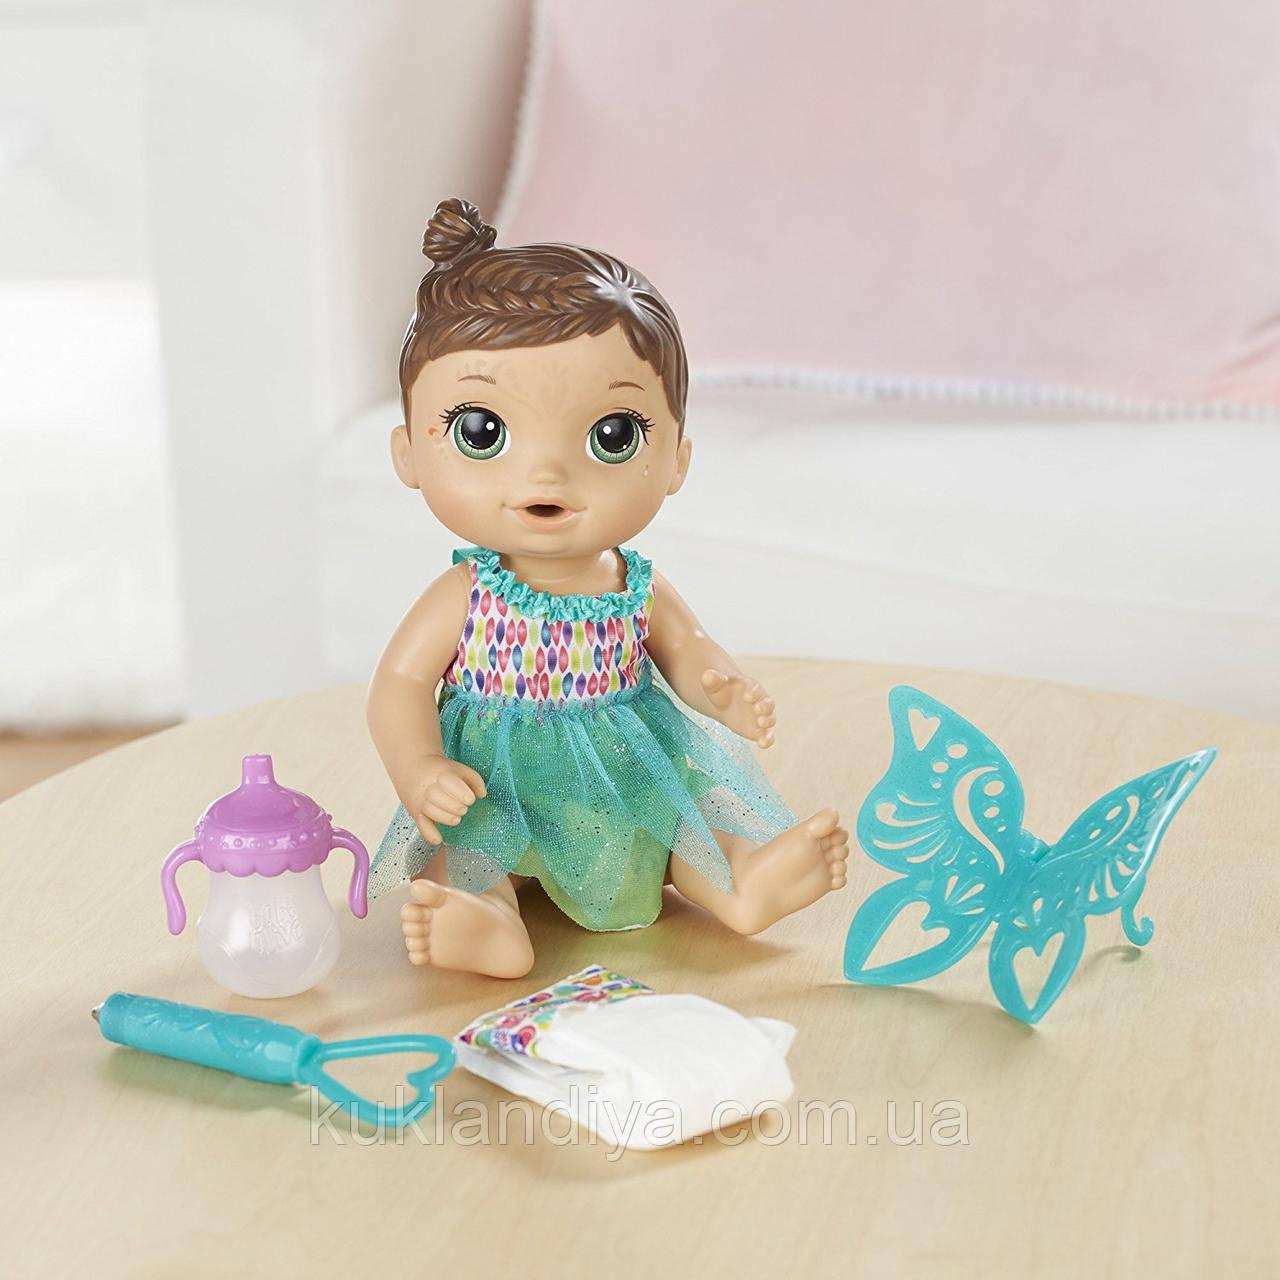 Baby Alive Кукла пупс Малышка Фея брюнетка Face Paint Fairy